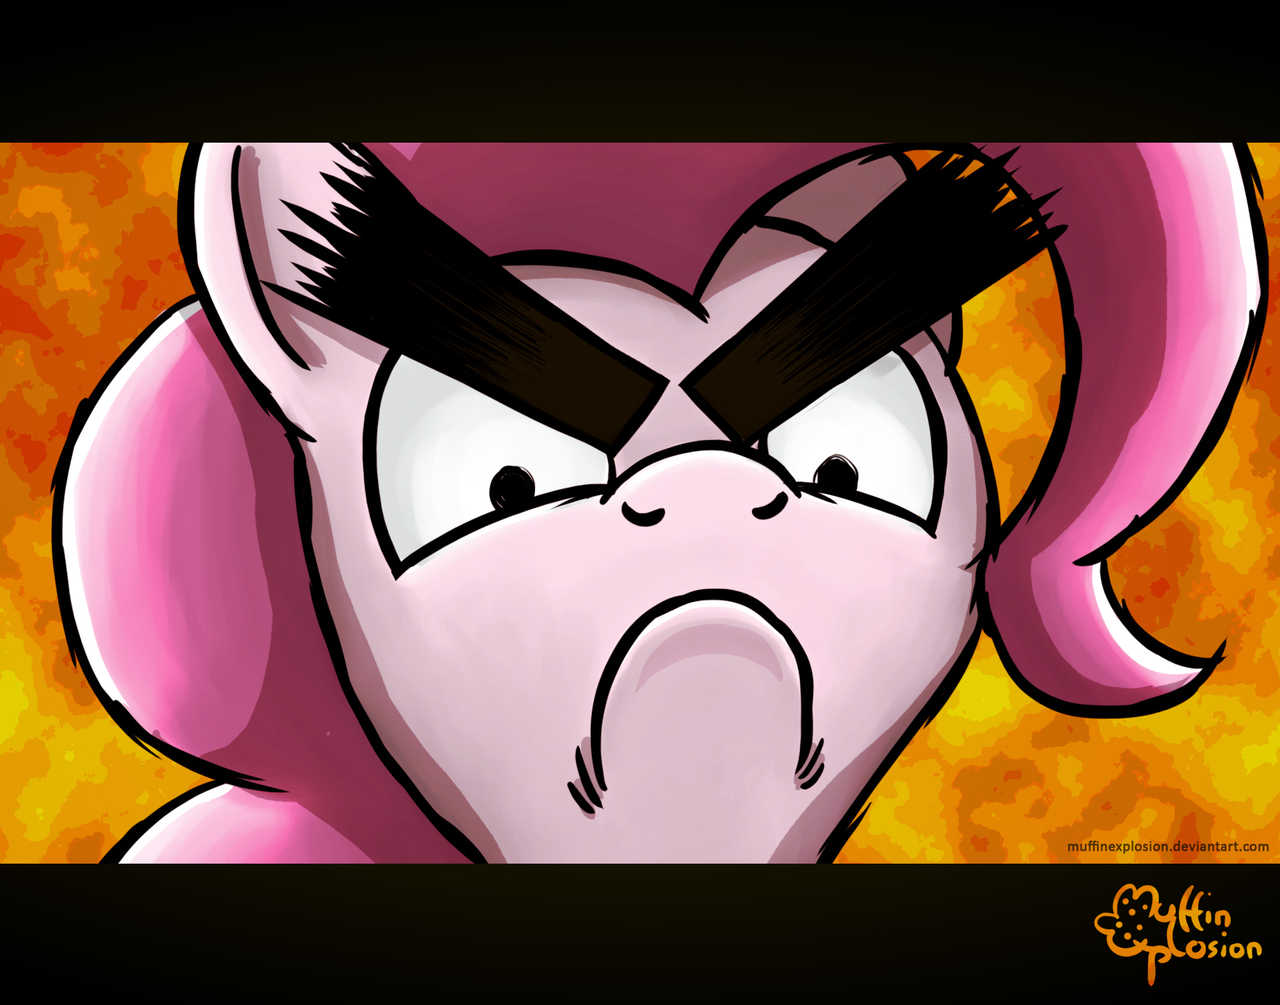 500235 Artistmuffinexplosion Eyebrows Flcl Pinkie Pie Safe